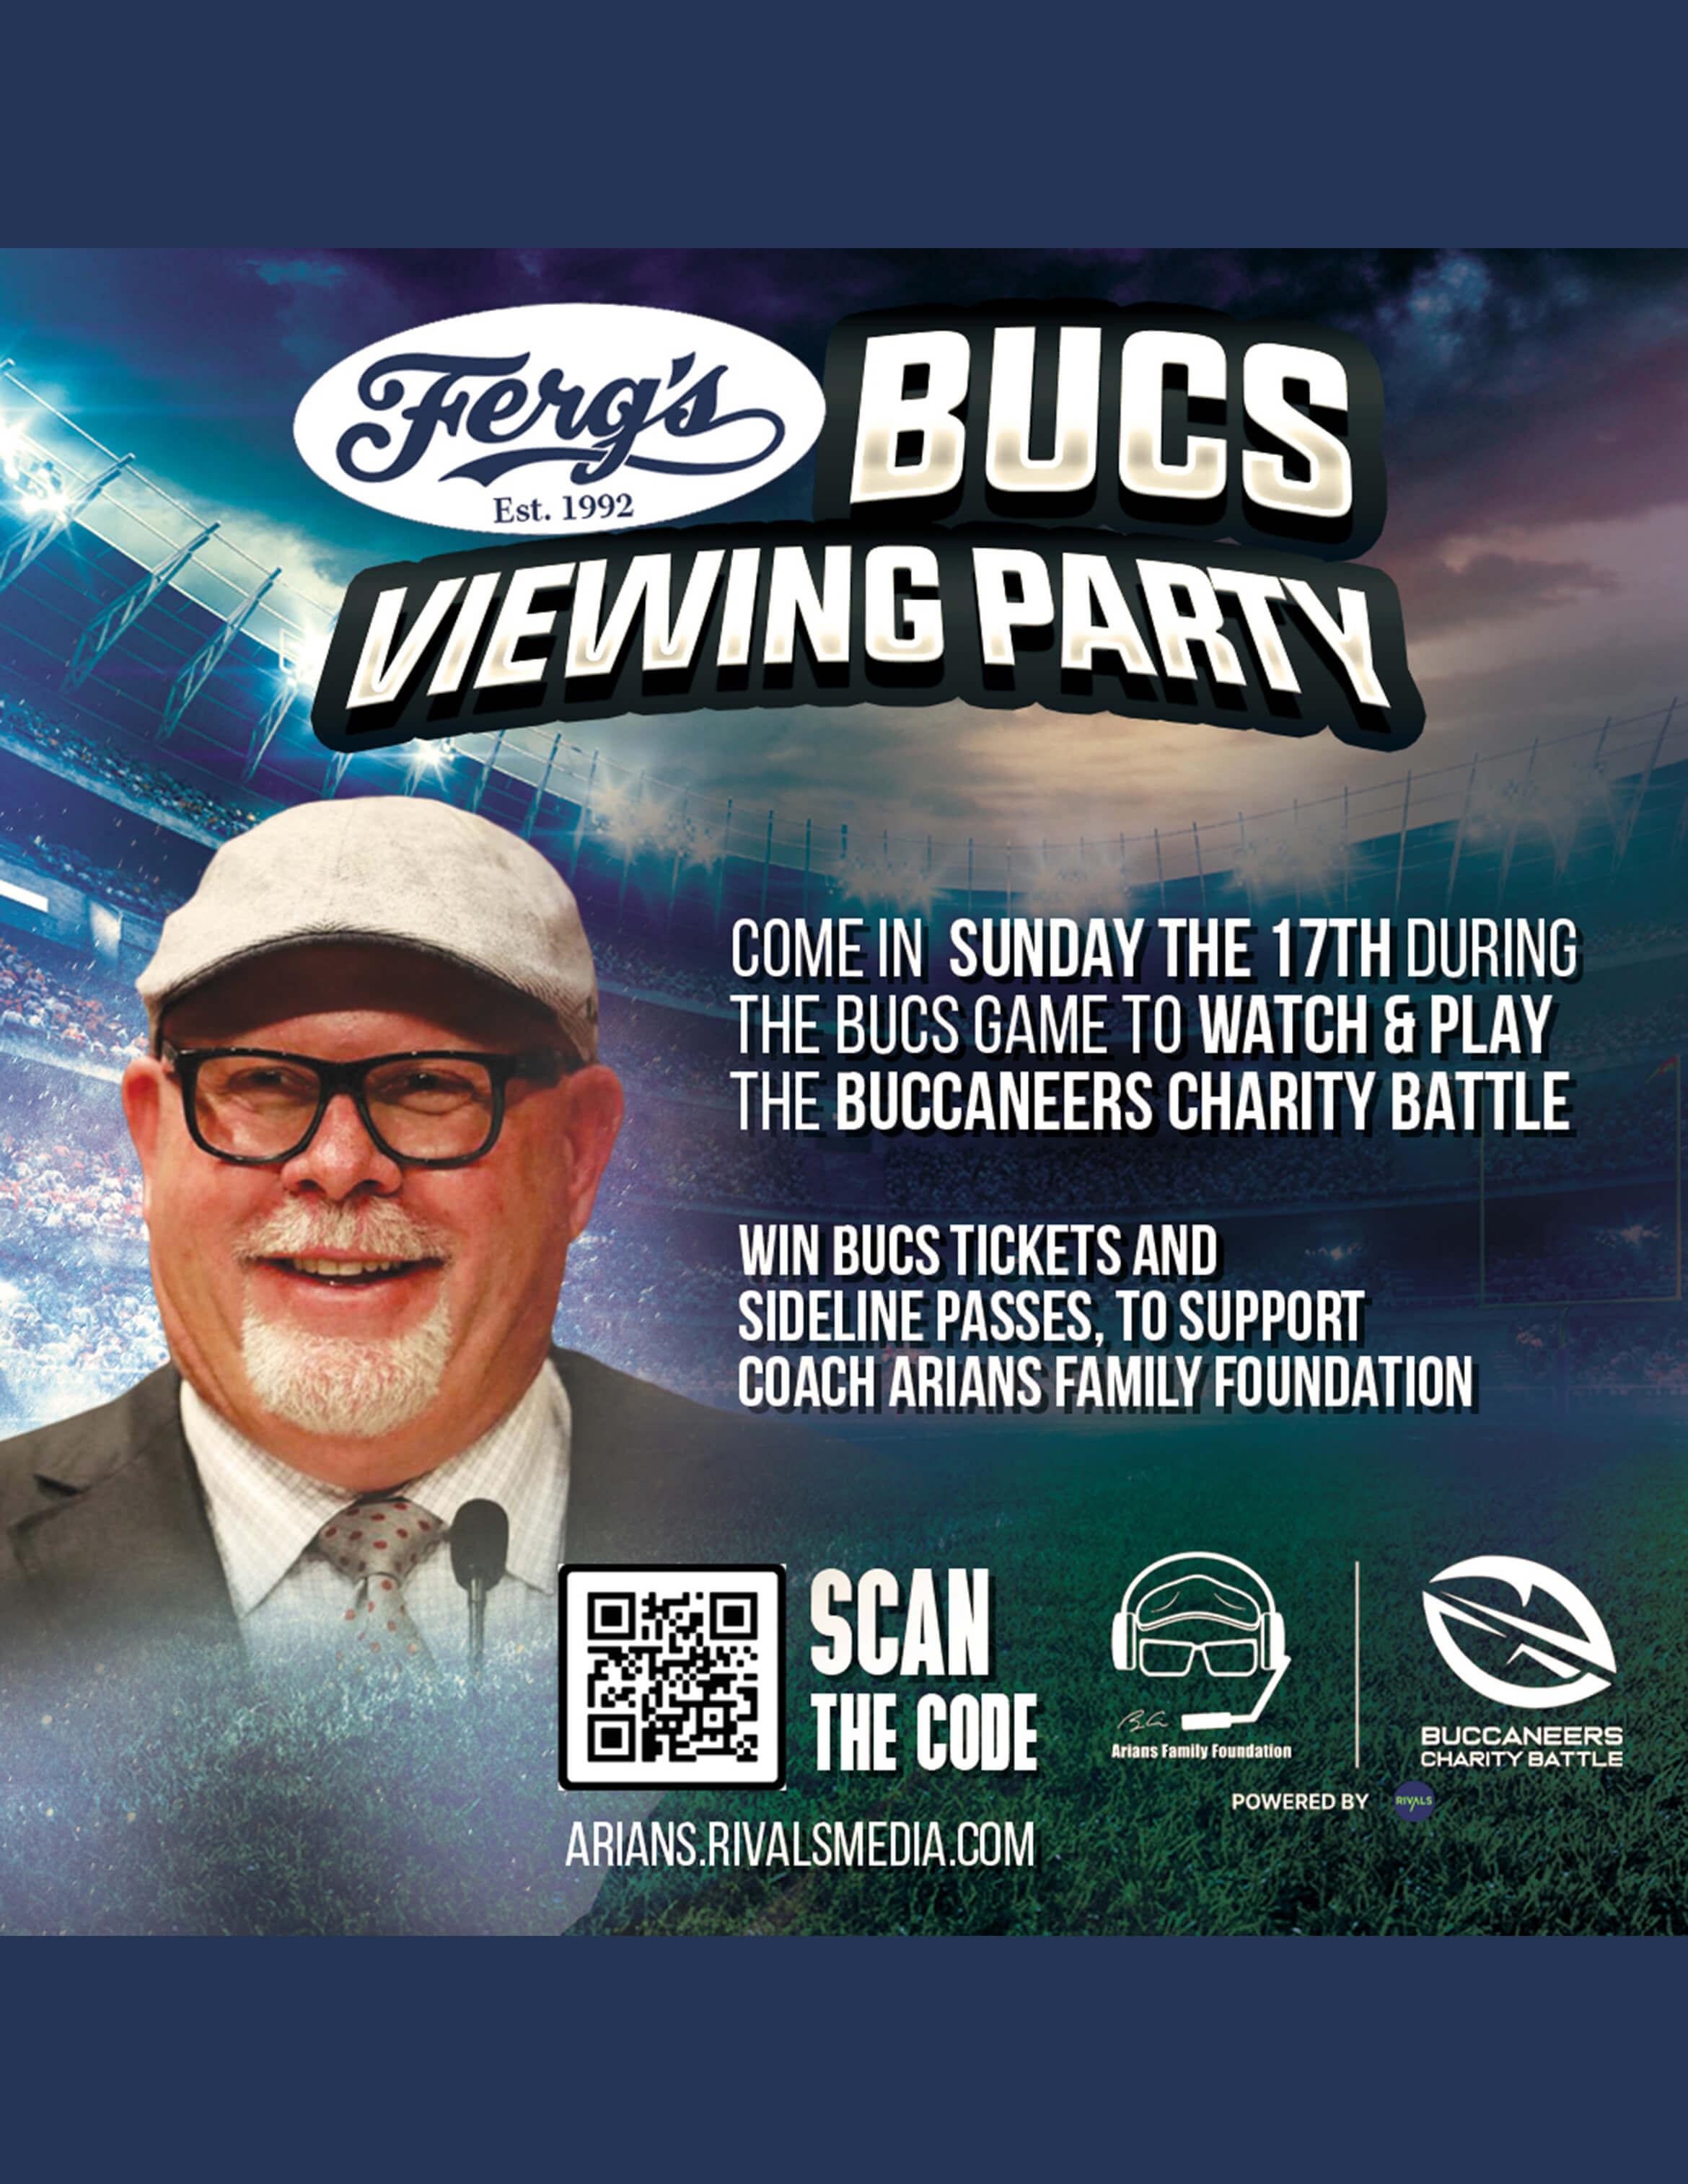 Bucs View Party 1/17/2021